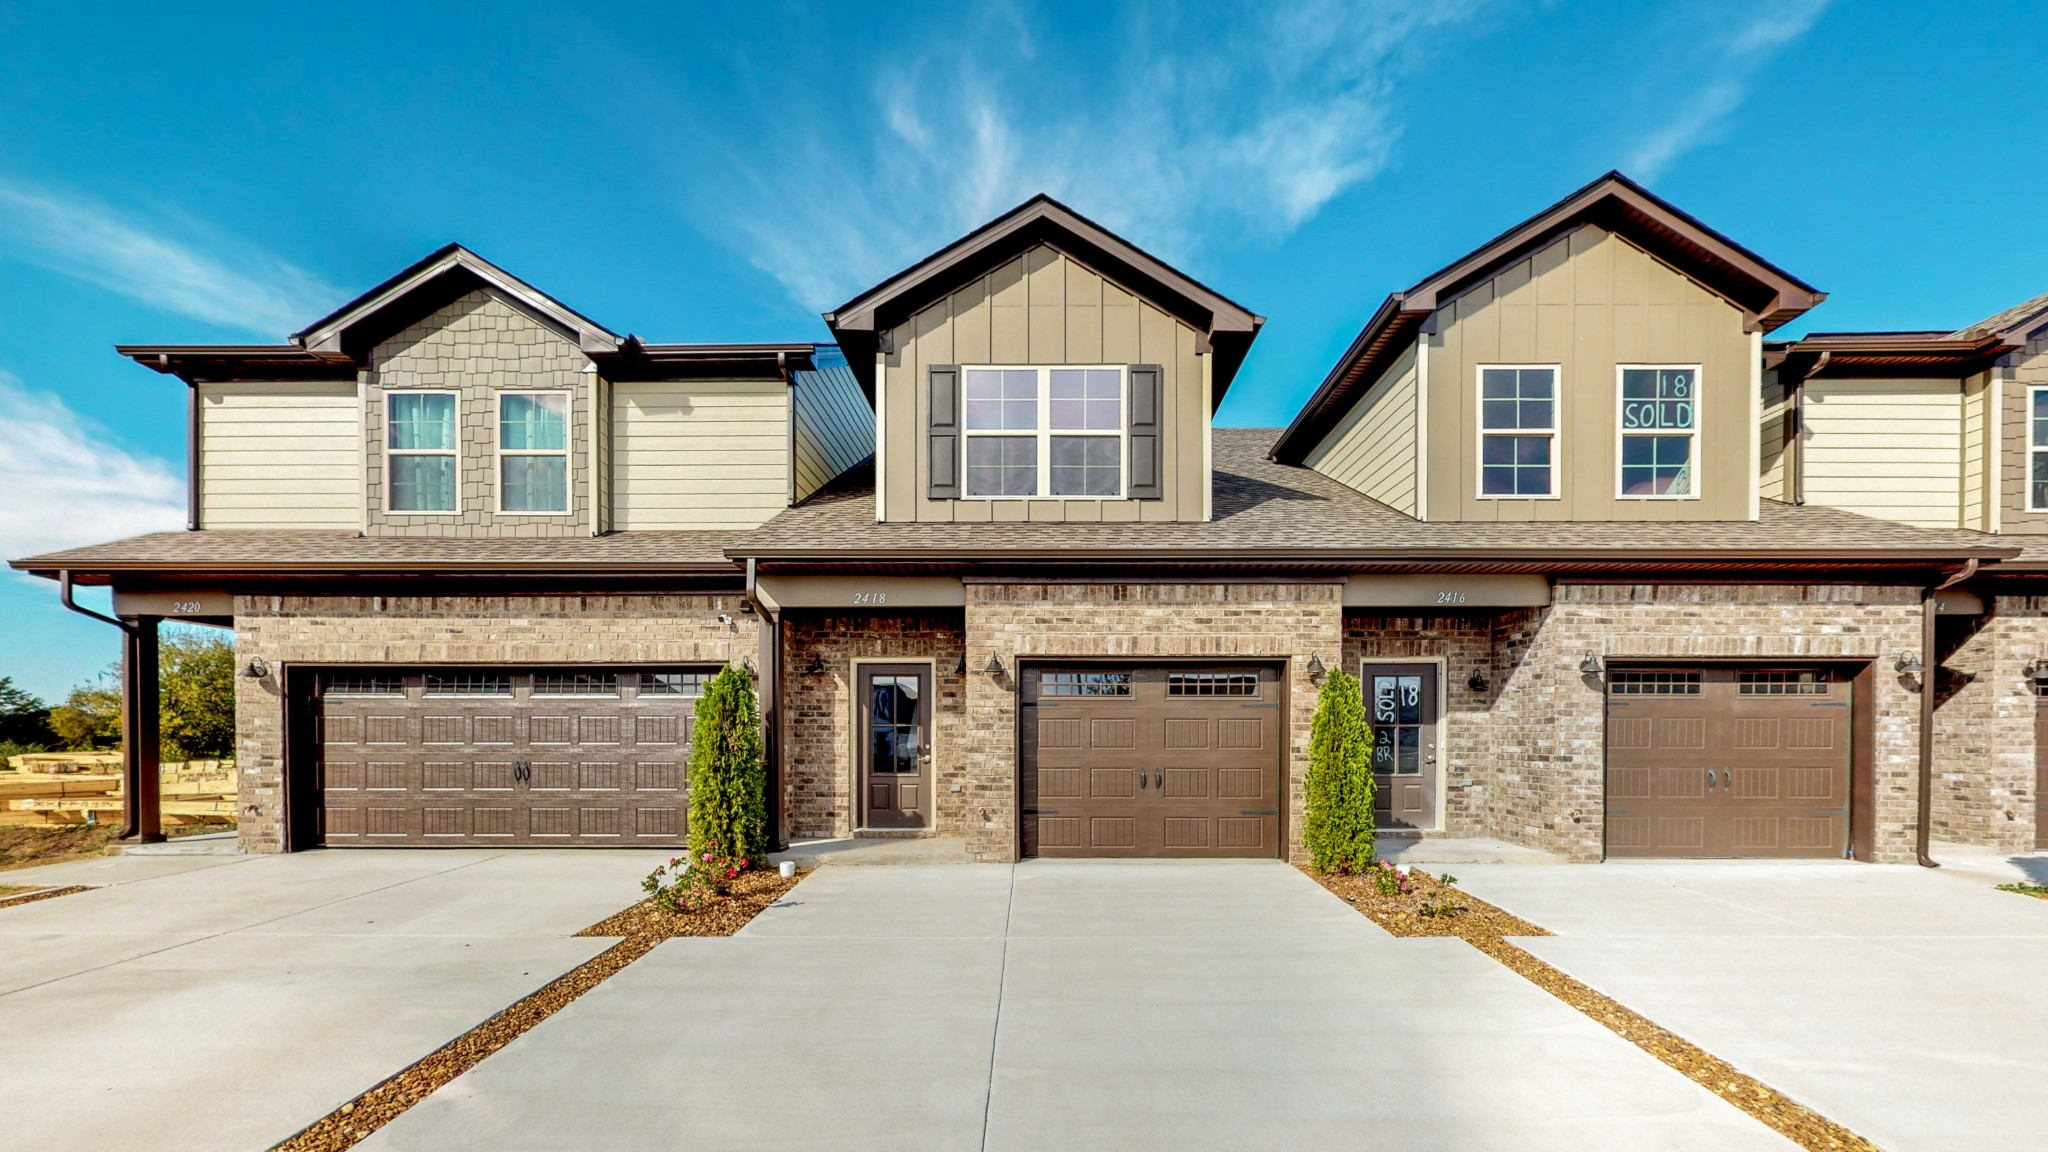 4119 Suntropic Ln - Lot 25, Murfreesboro, TN 37127 - Murfreesboro, TN real estate listing